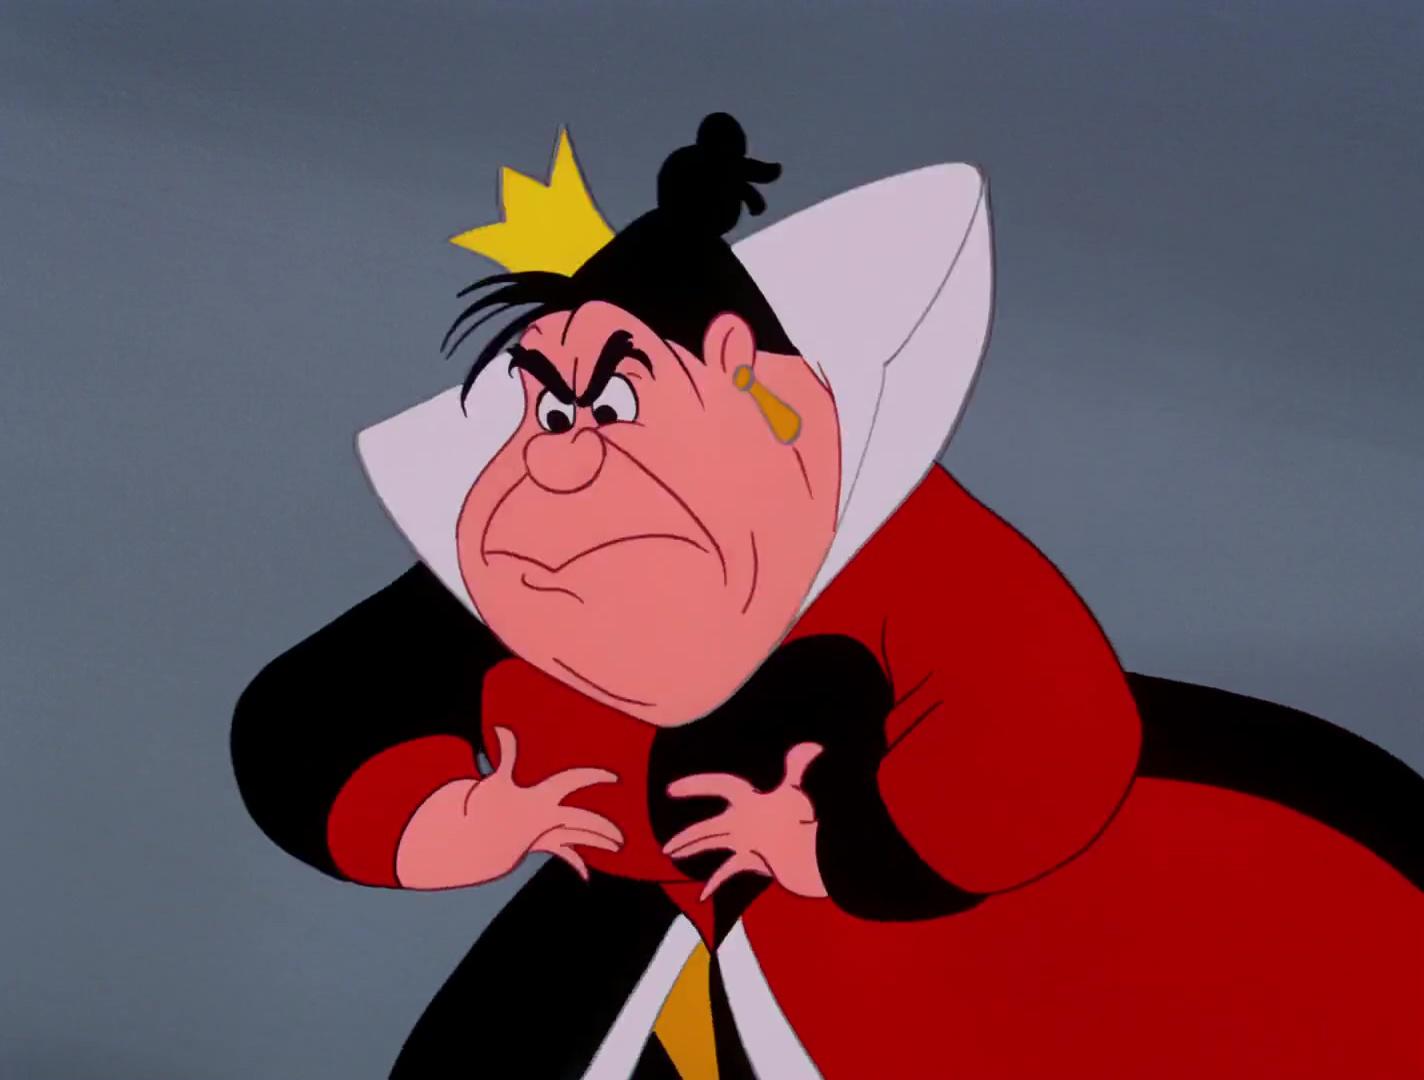 Reine coeur Queen hearts Personnage Alice au pays des merveilles Disney Character Wonderland